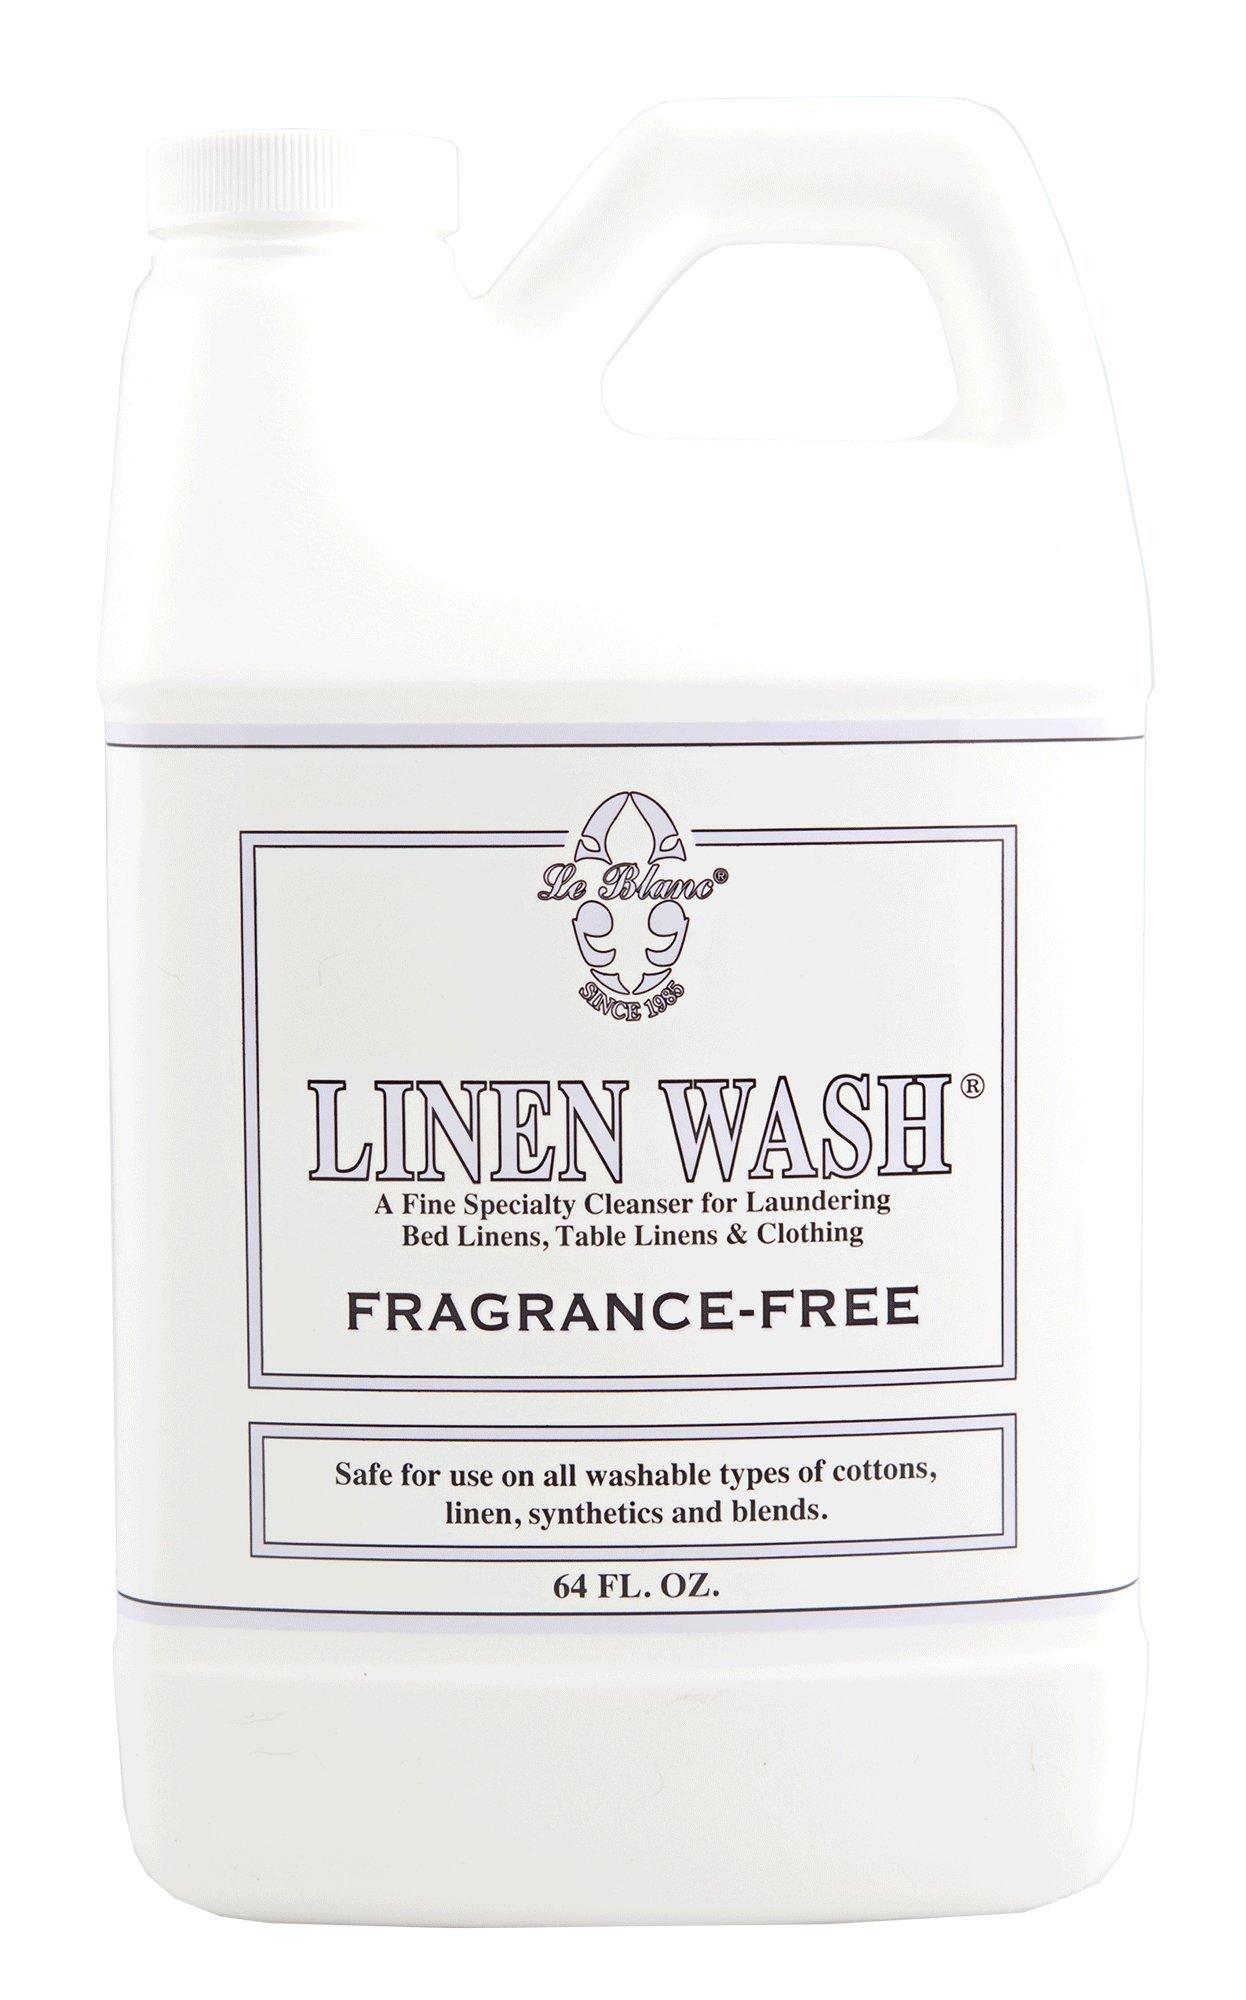 Le Blanc® Fragrance Free Linen Wash - 64 FL. OZ, 3 Pack